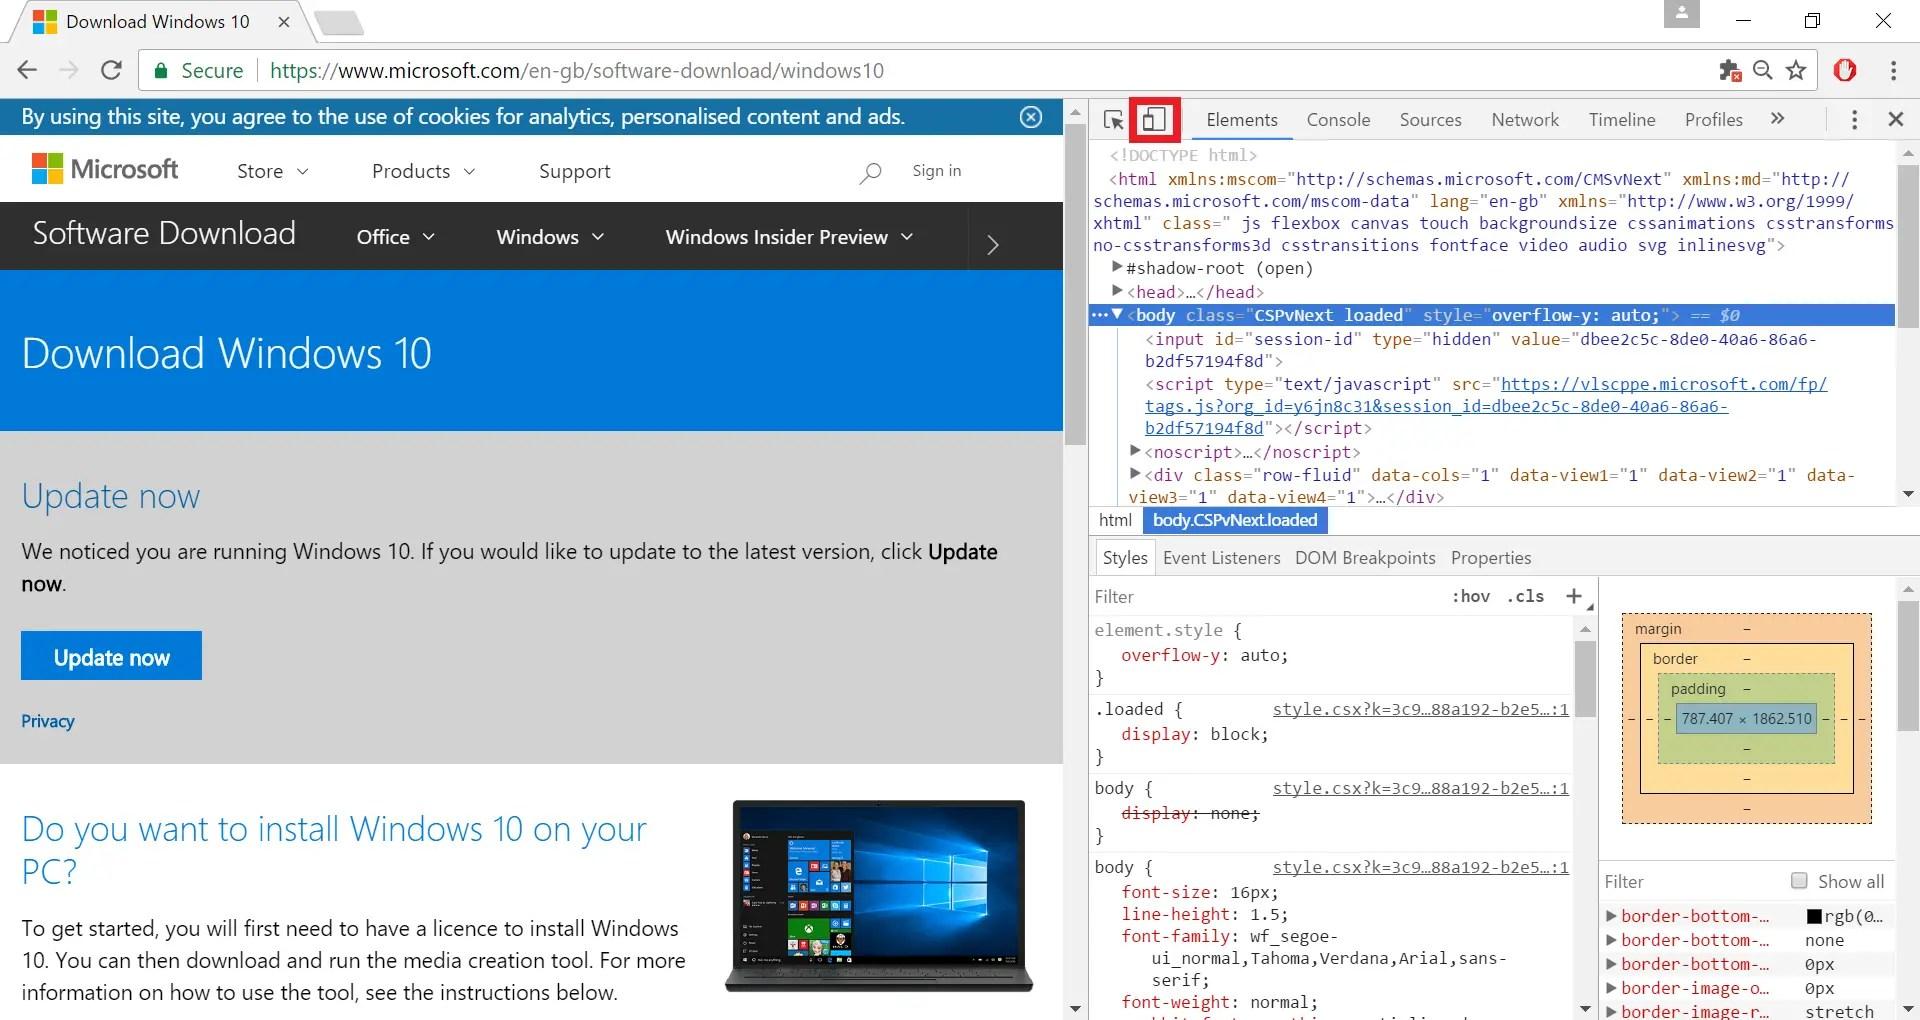 Download Windows 10 RS2 Version 1703 Build 15063 Creator's